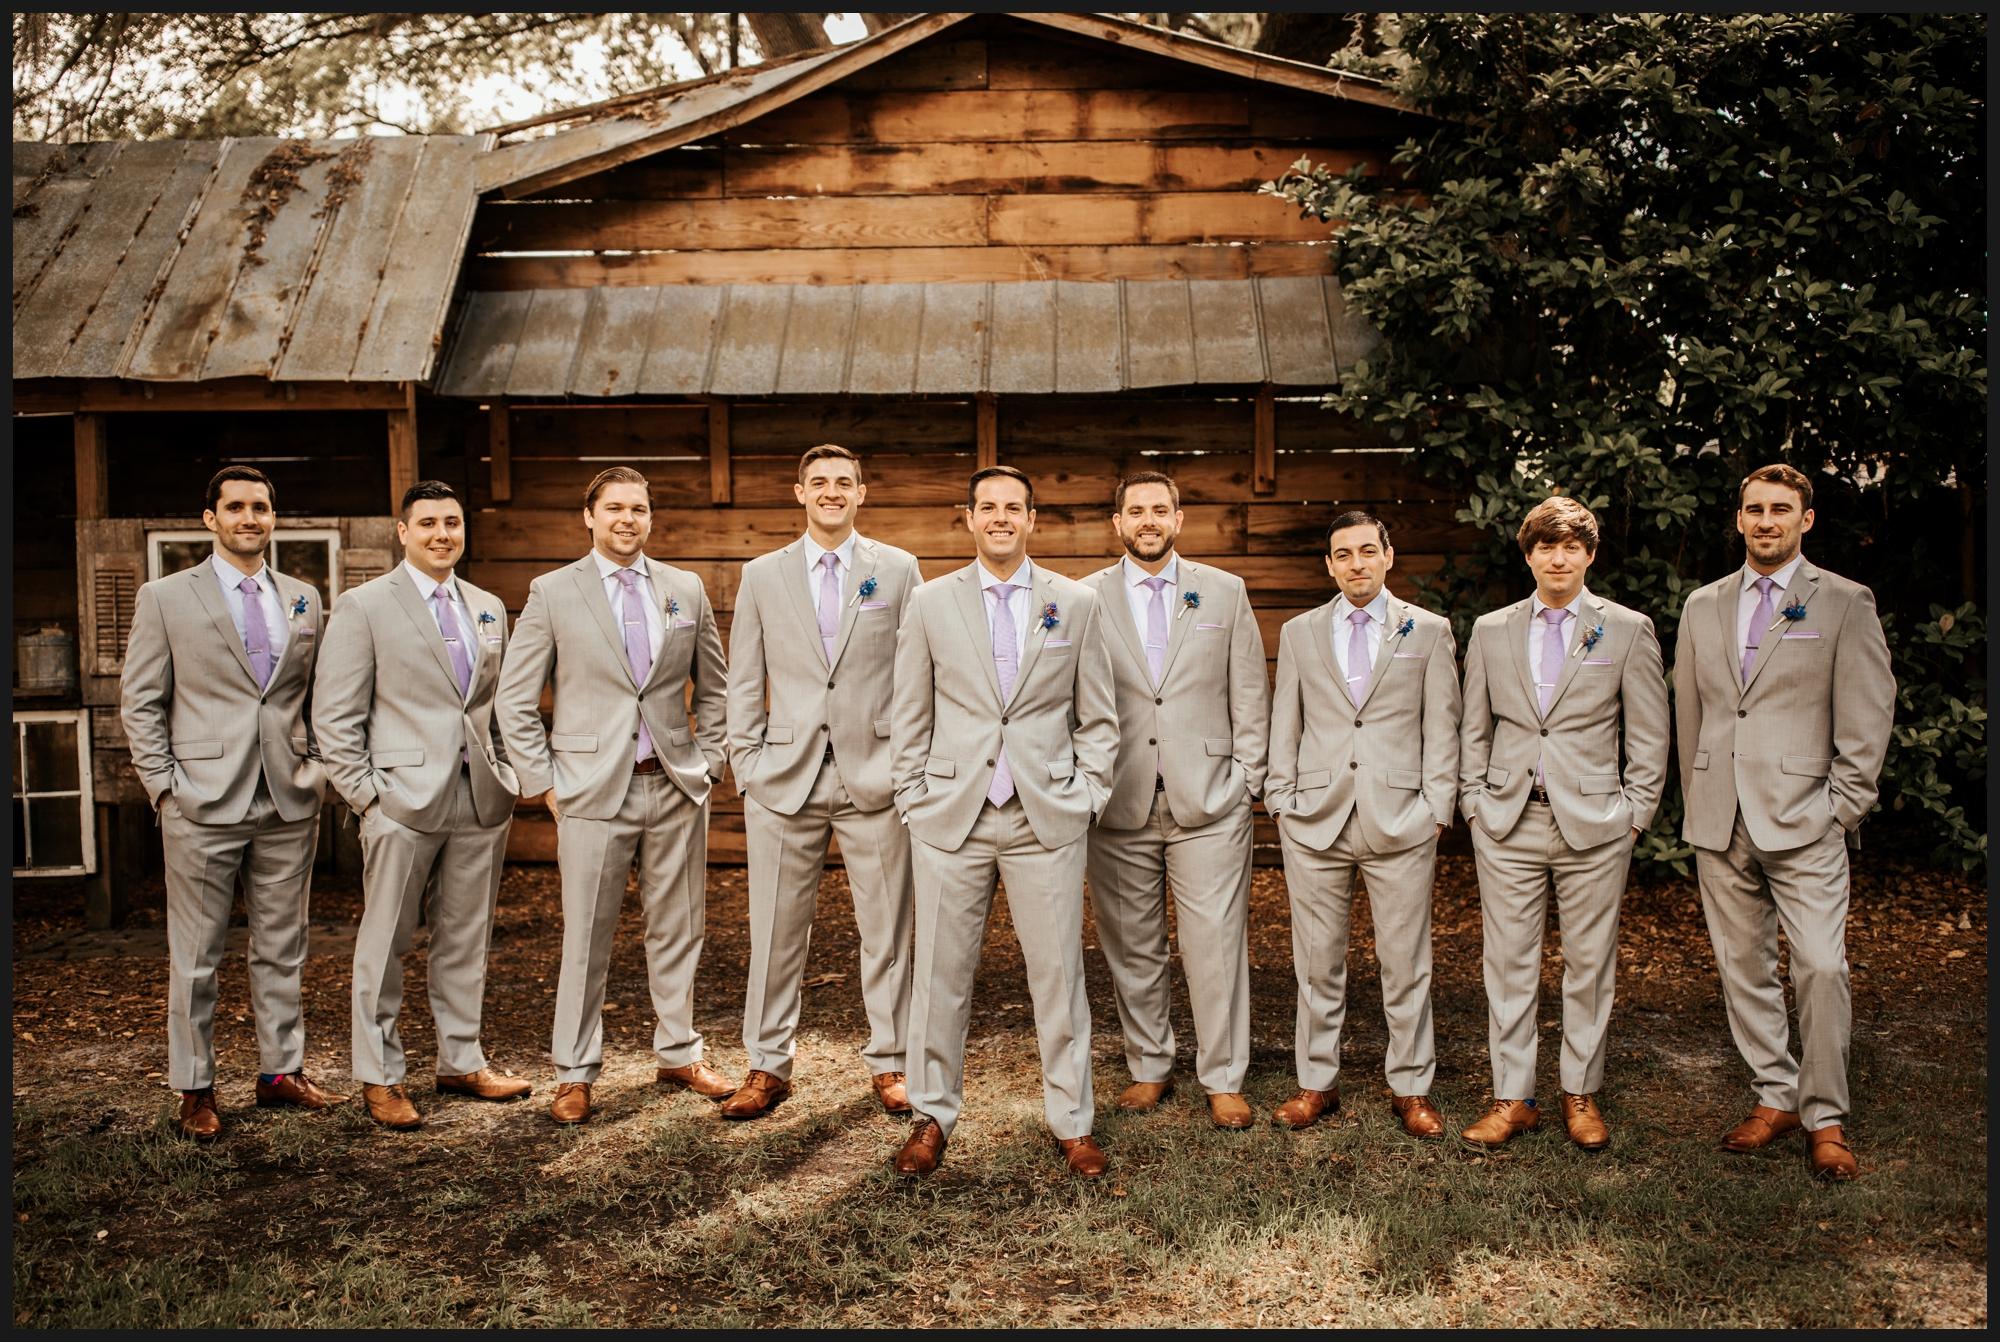 Orlando-Wedding-Photographer-destination-wedding-photographer-florida-wedding-photographer-bohemian-wedding-photographer_1604.jpg